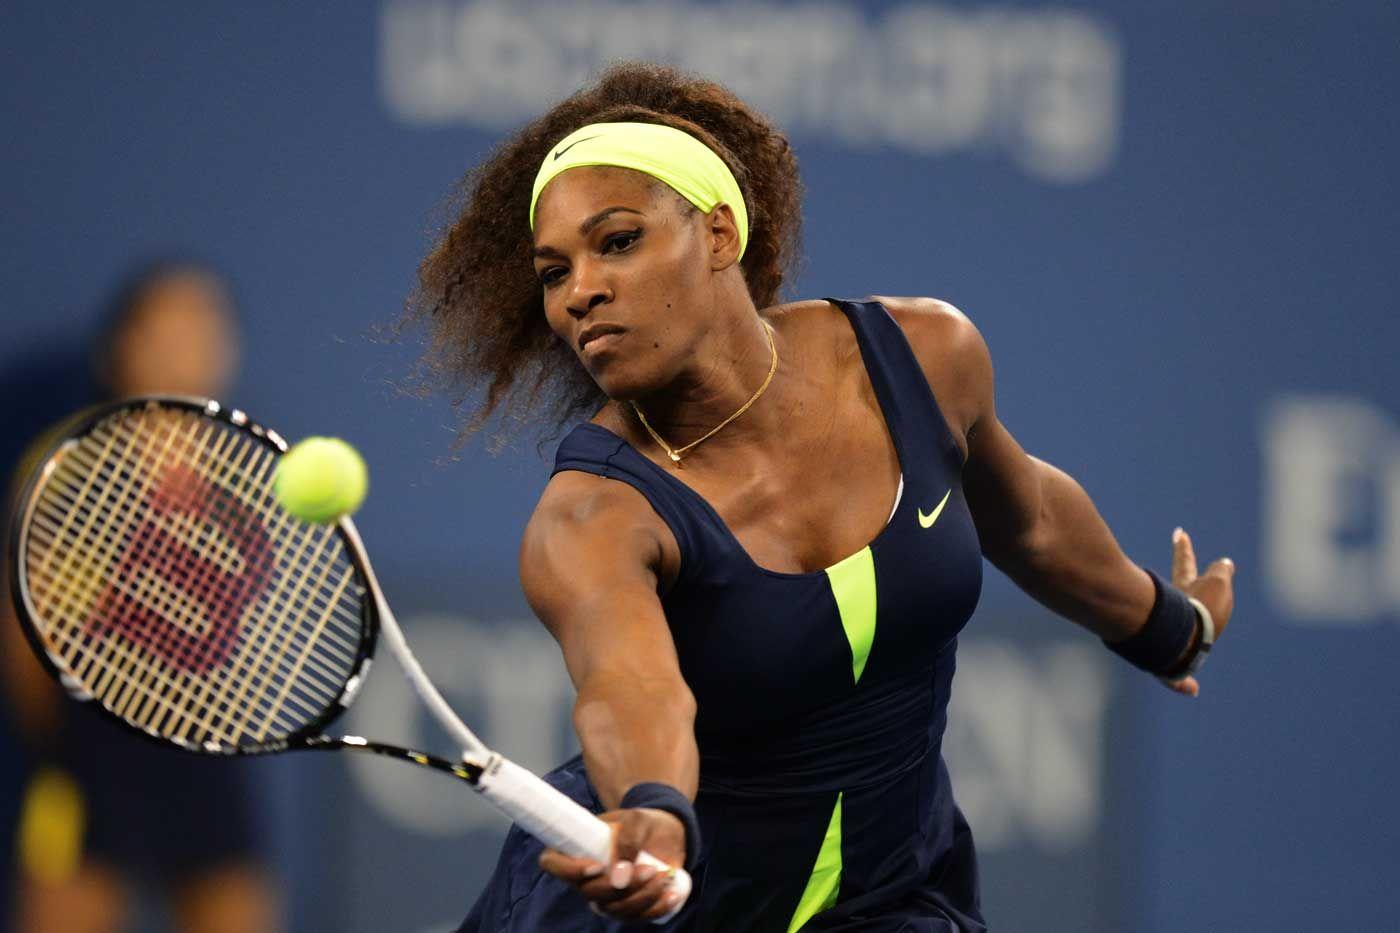 American Tennis Superstar Serena Williams Focused Committed Serena Williams Tennis Serena